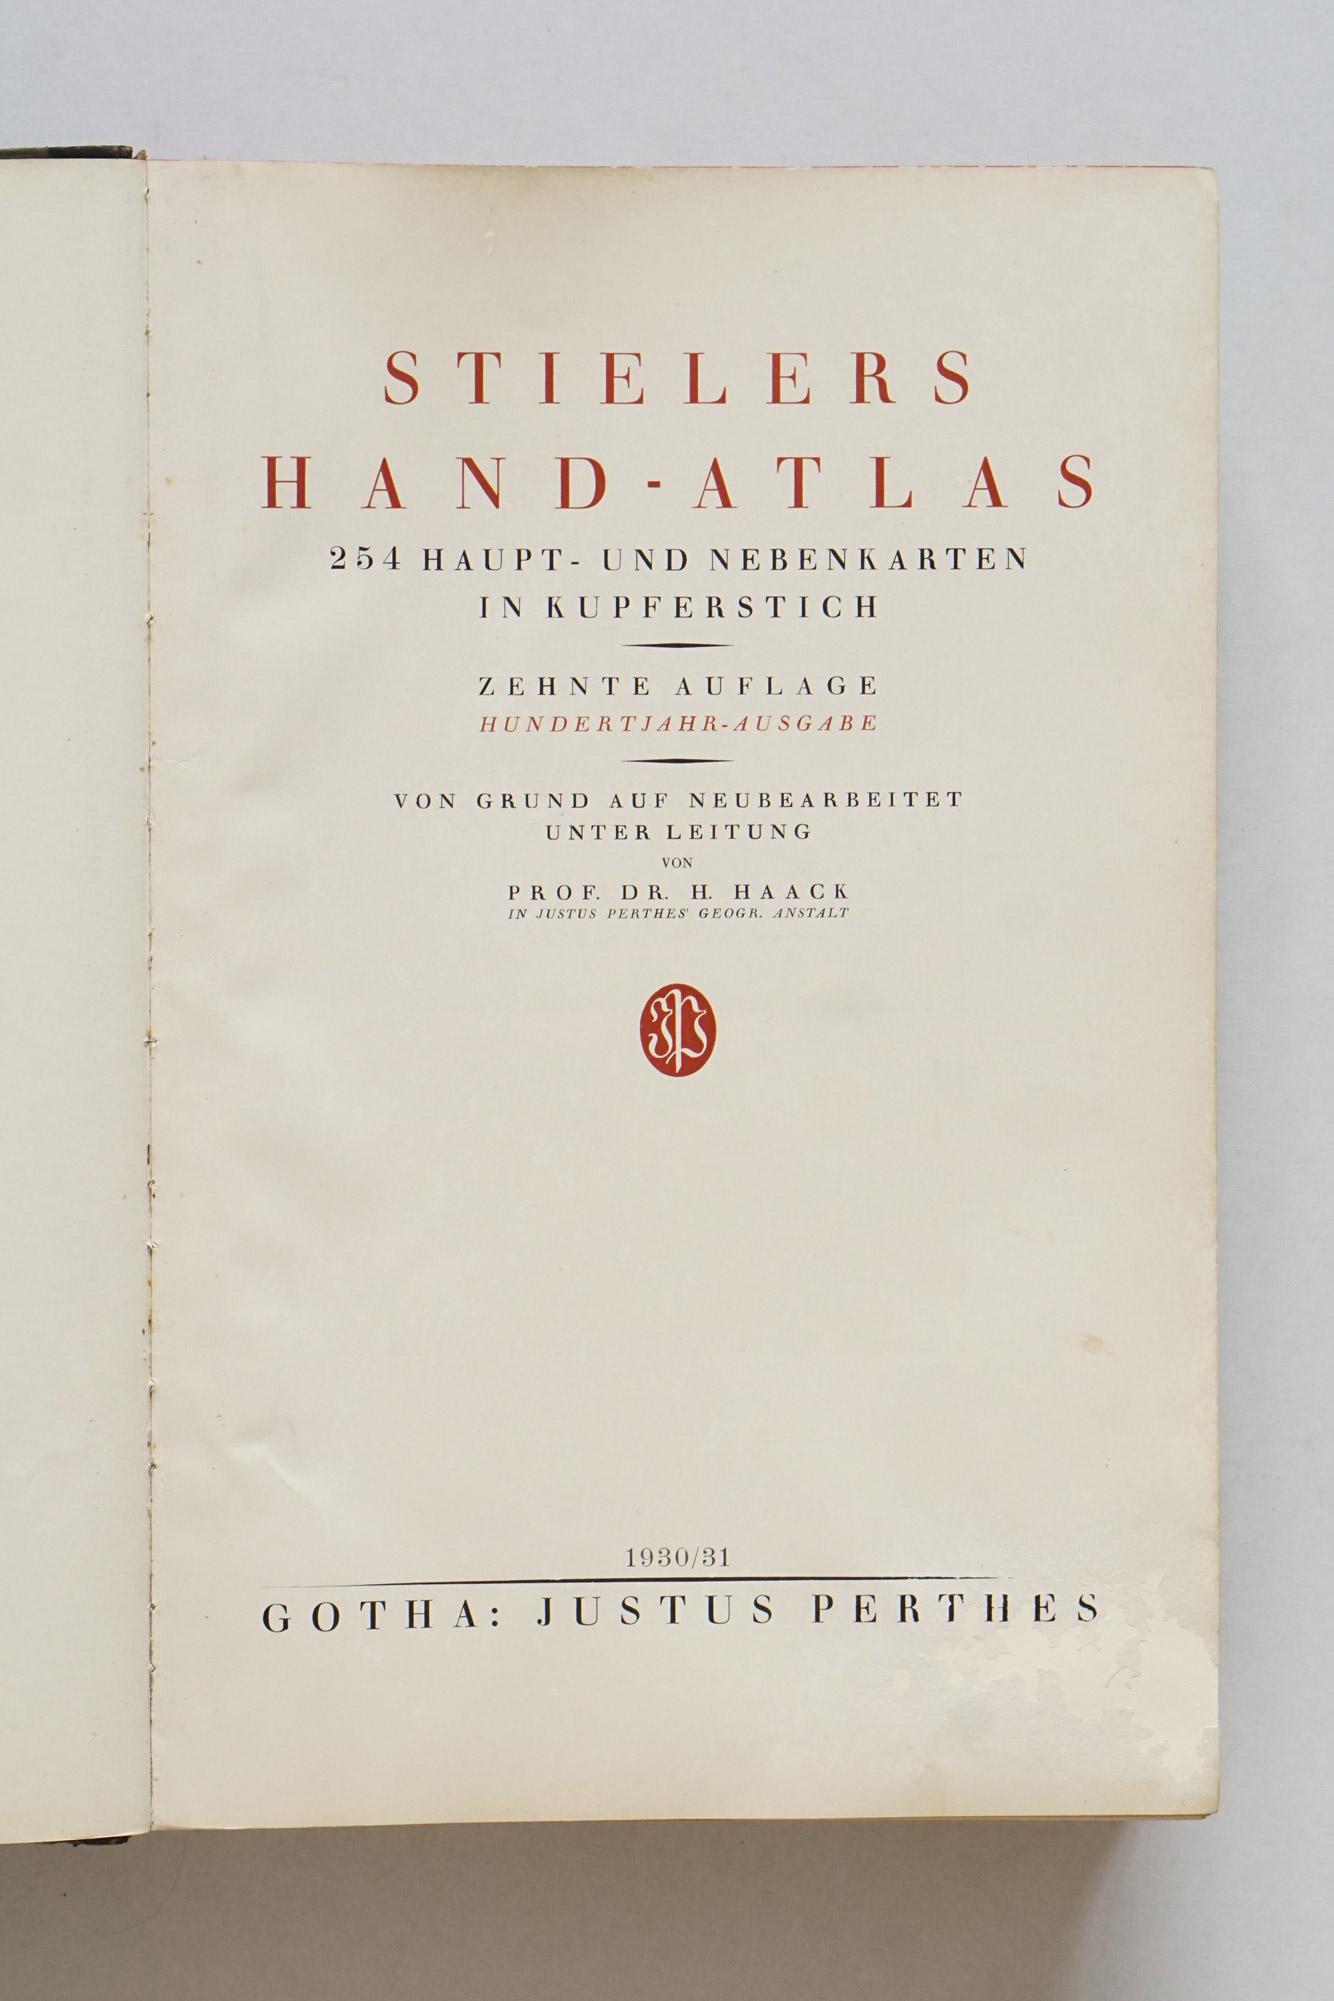 Stielers Handatlas, 10th edition